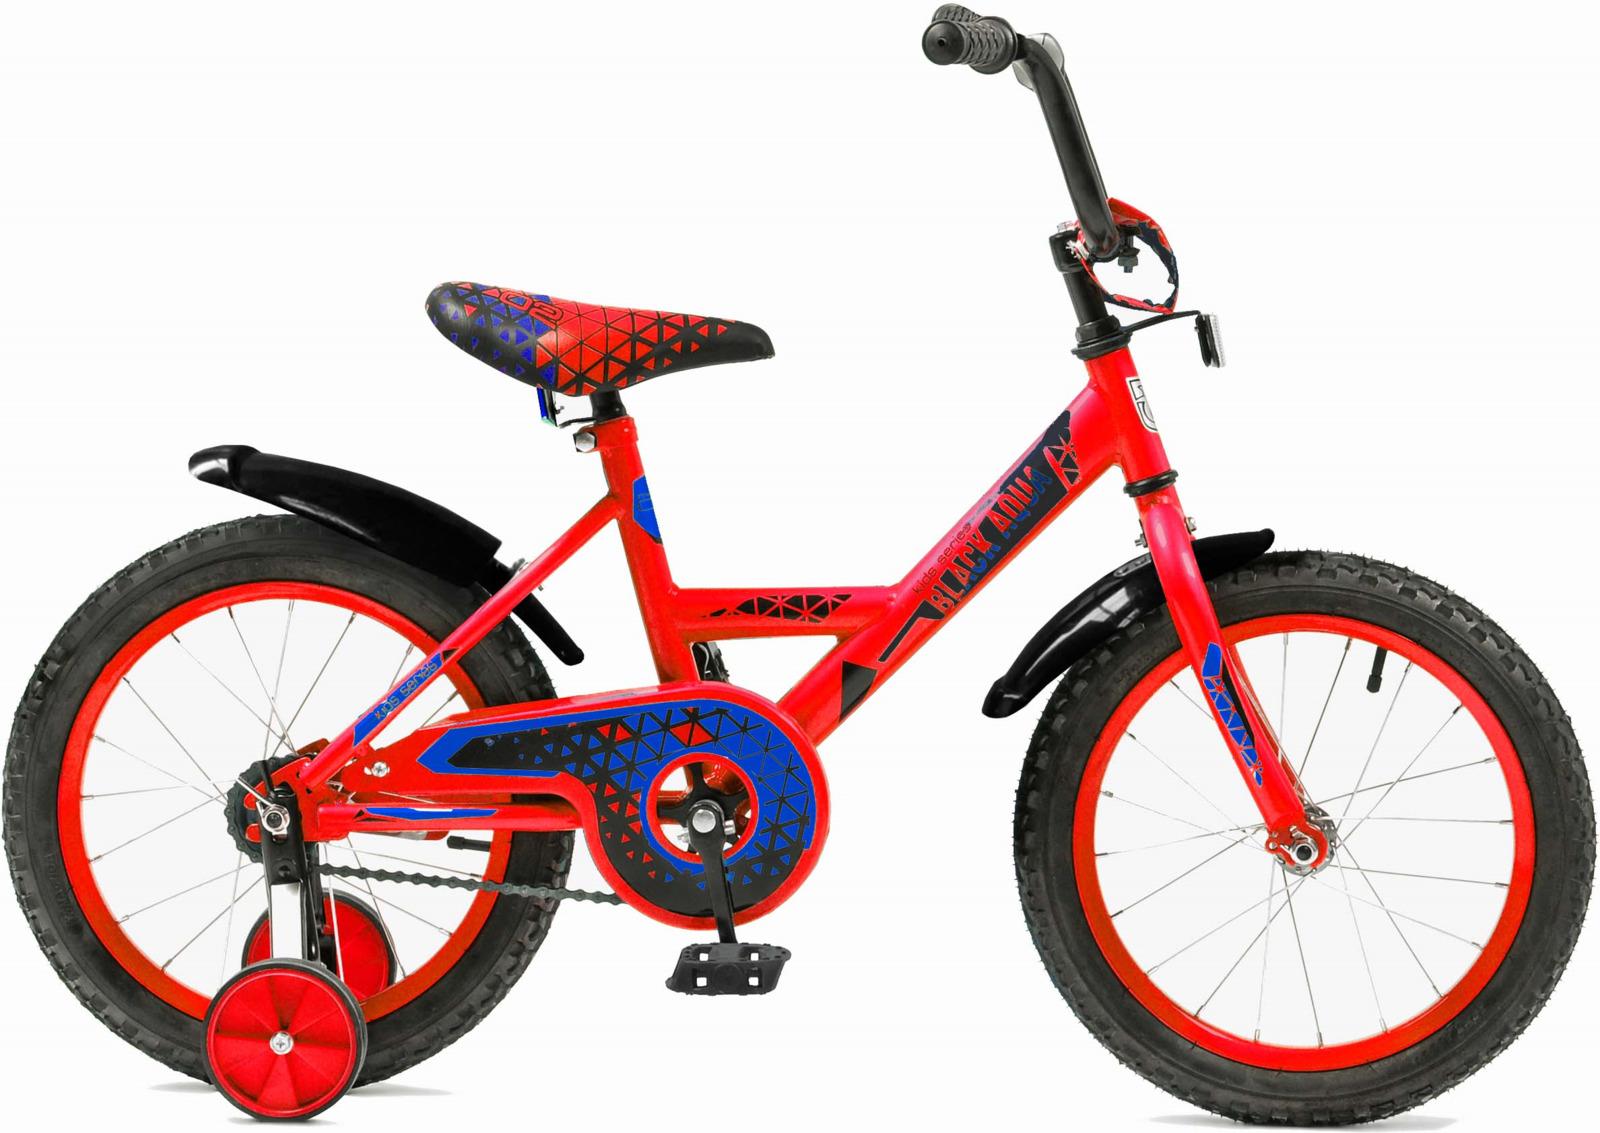 Велосипед детский Black Aqua Base-T, CH-1602B, колесо 16